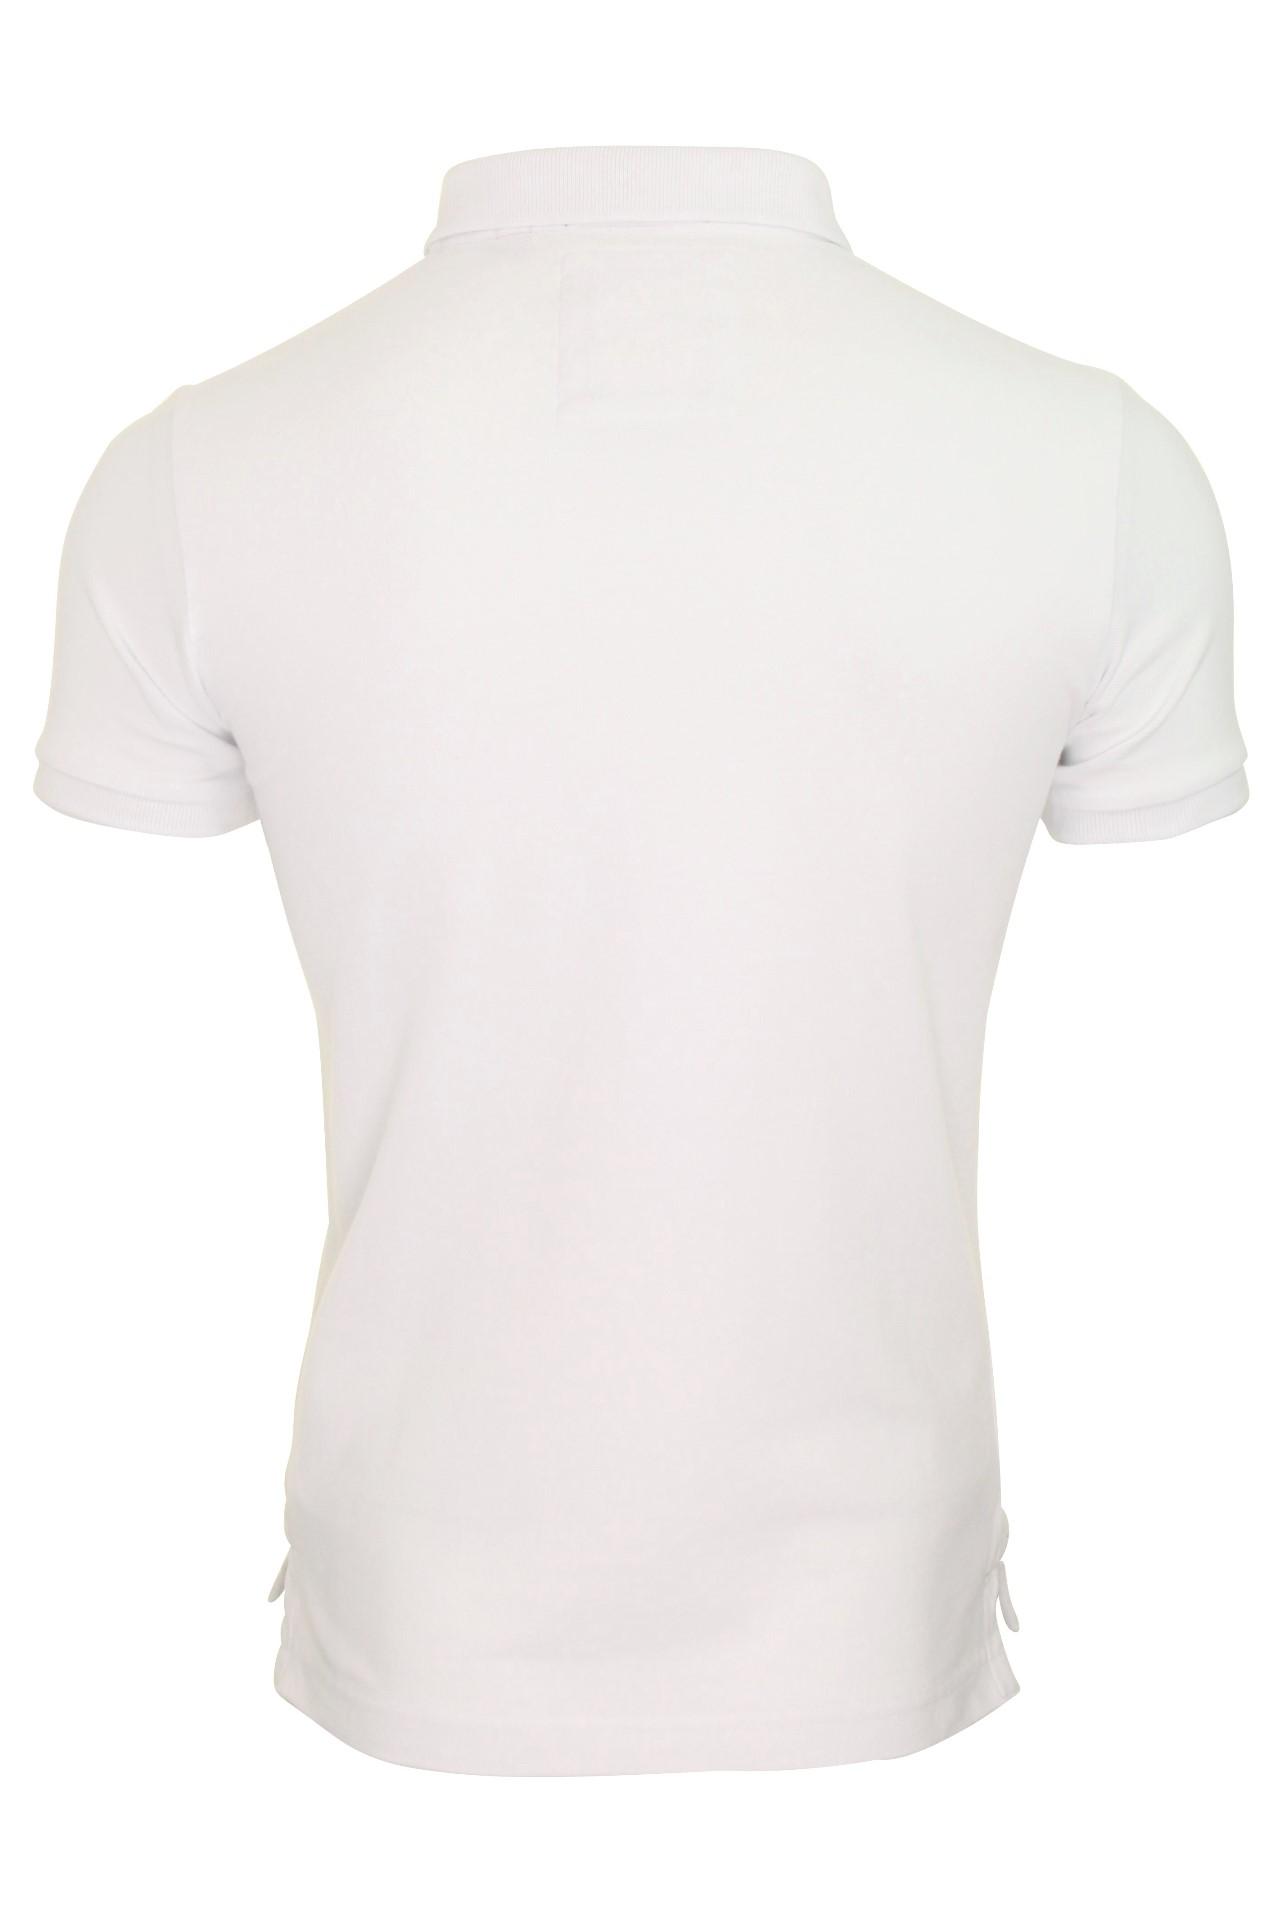 Camisa-clasica-para-hombre-039-Camiseta-Polo-Pique-039 miniatura 14